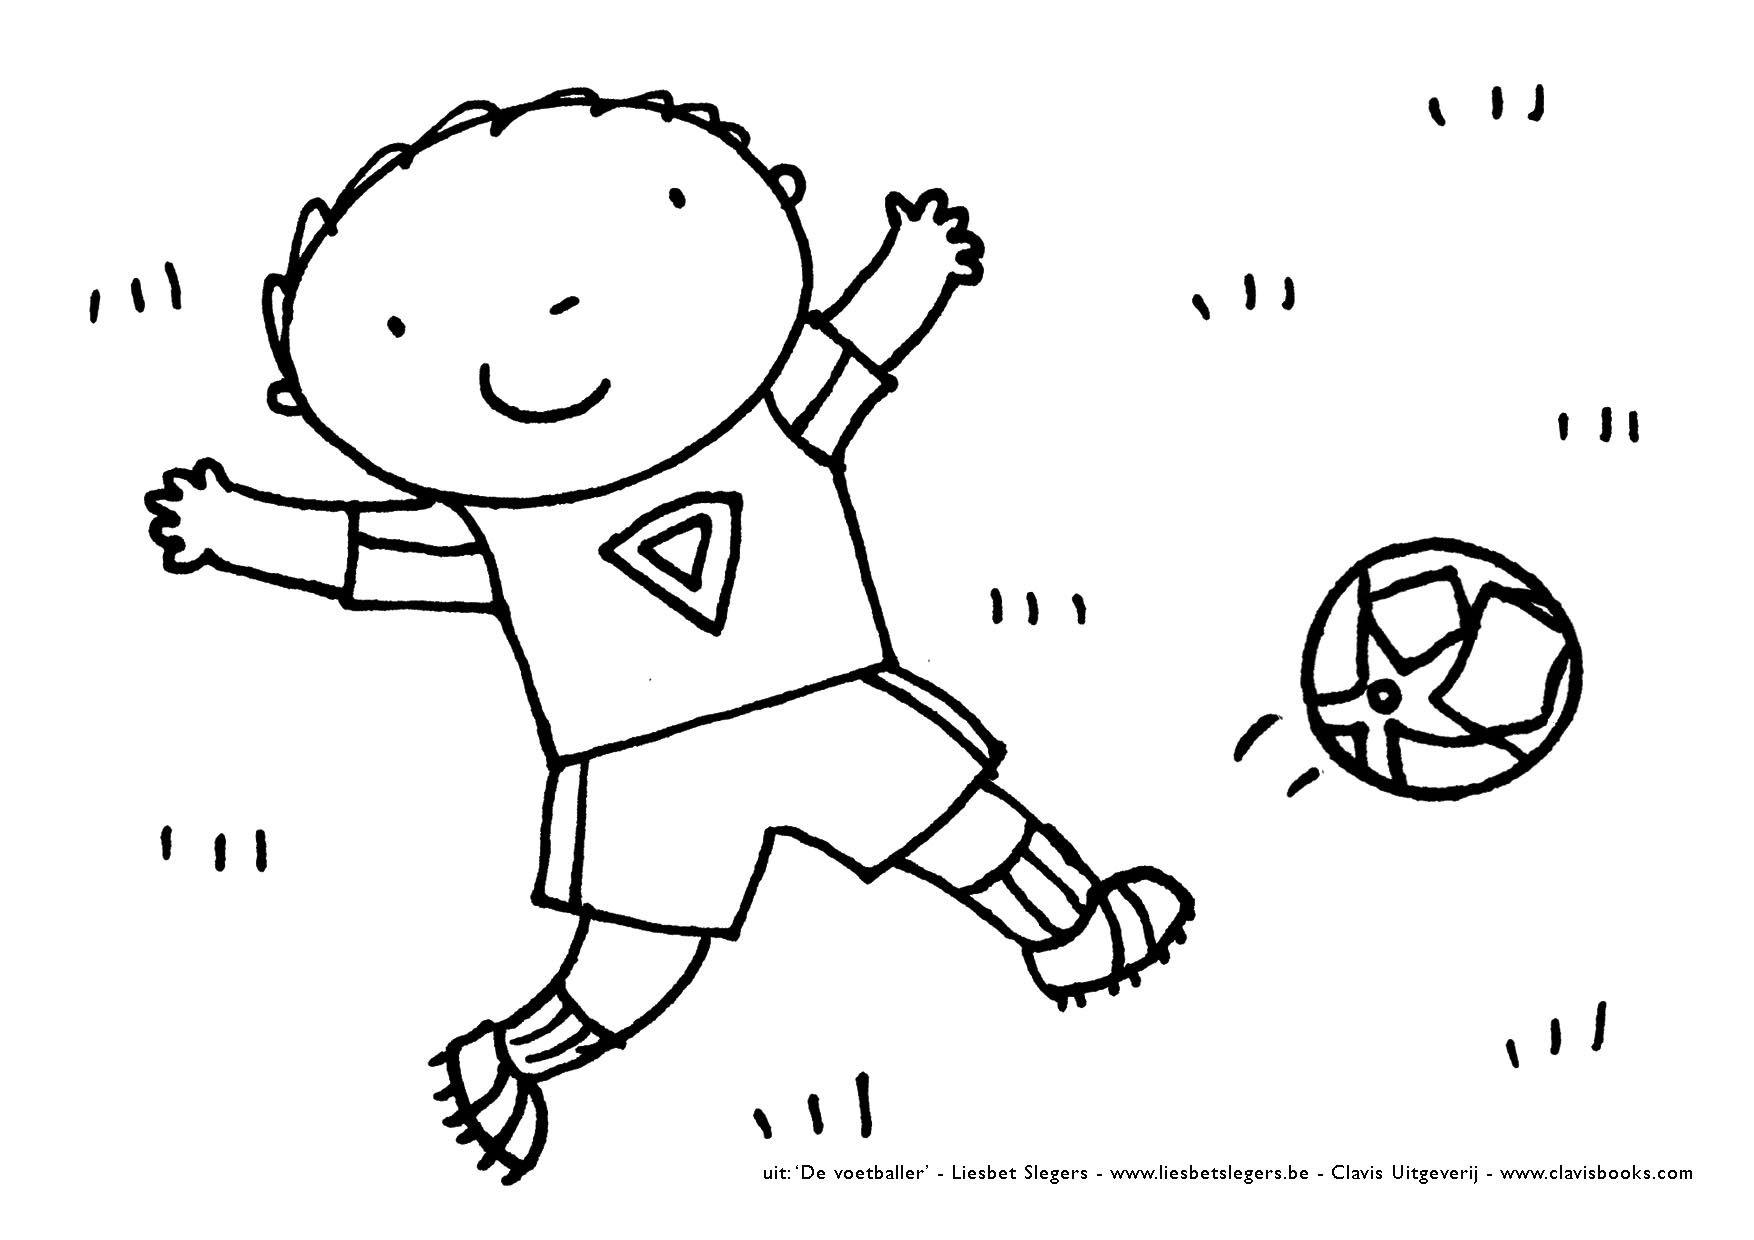 De Voetballer Jpg 1754 1240 Voetballers Voetbal Voetballen